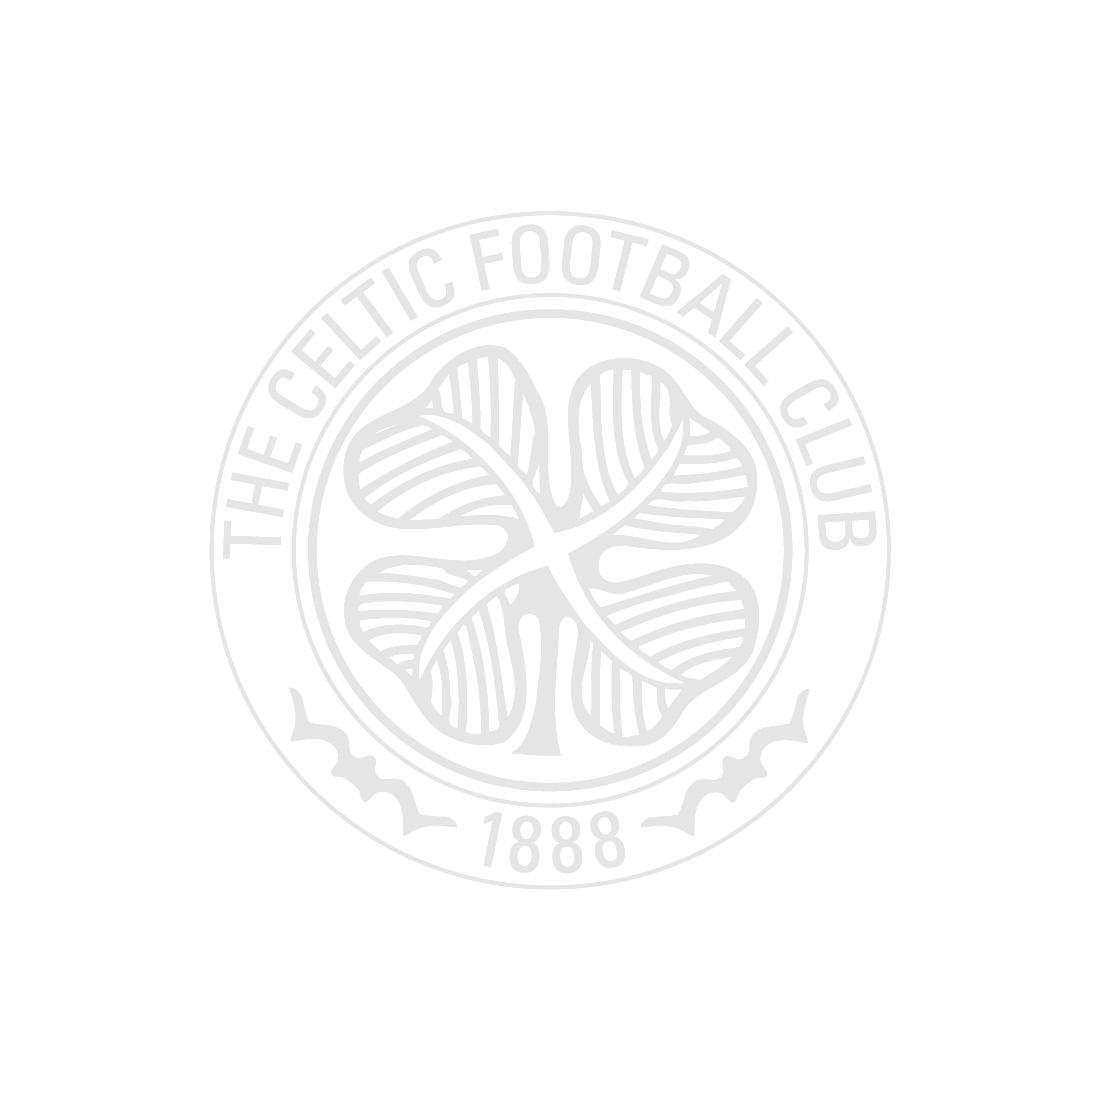 Celtic Double Treble Scarf